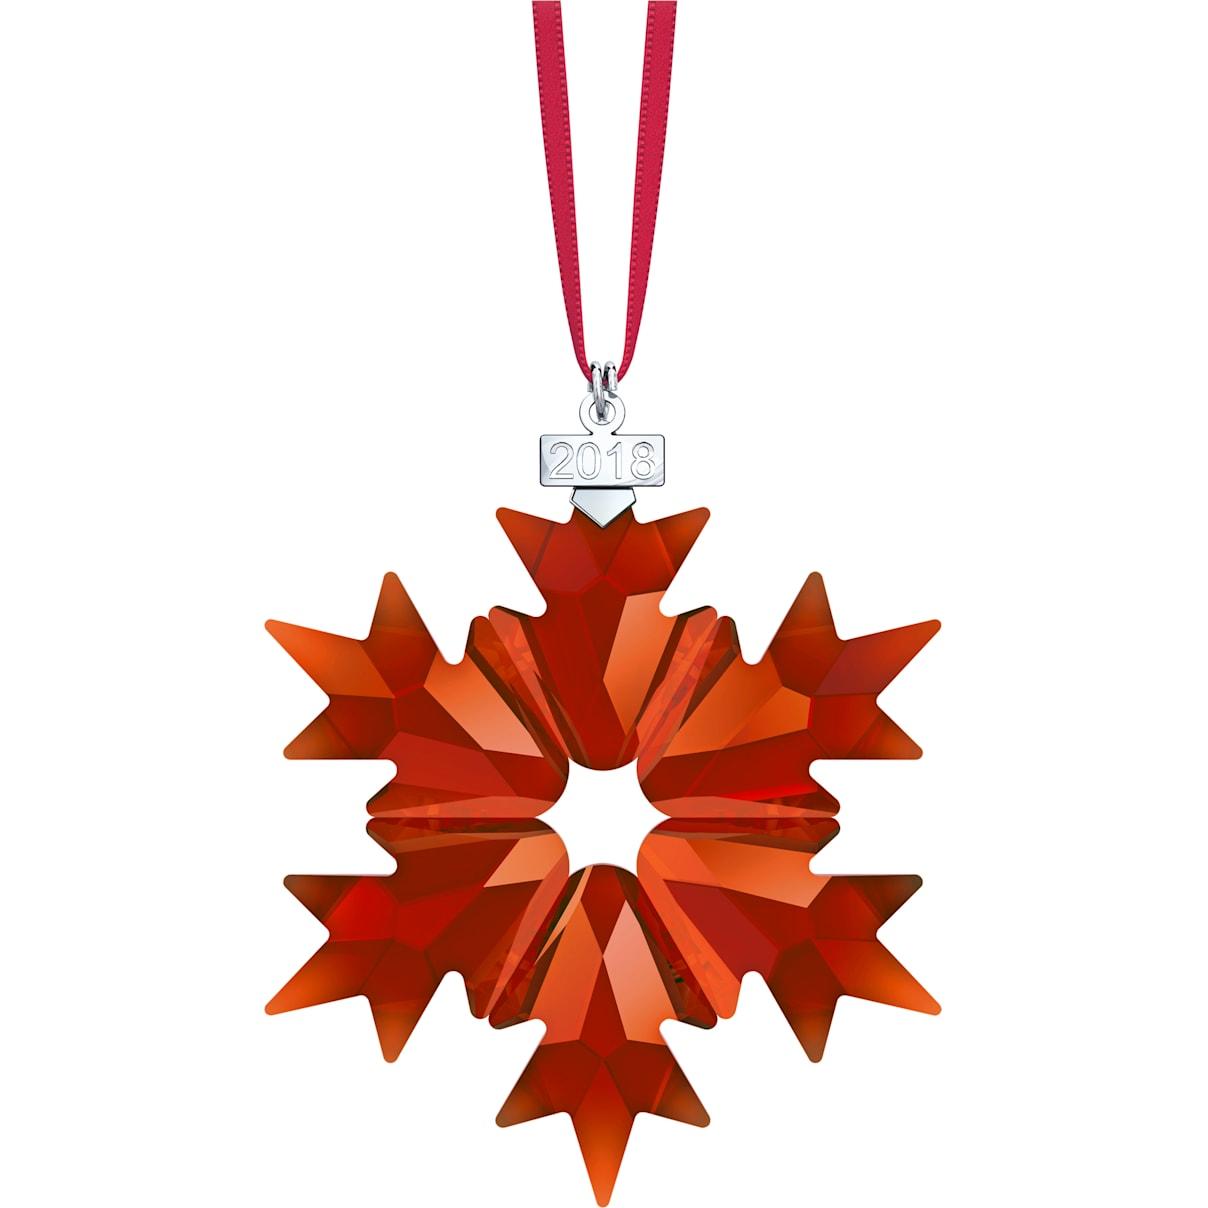 Swarovski Holiday Ornament, Annual Edition 2018